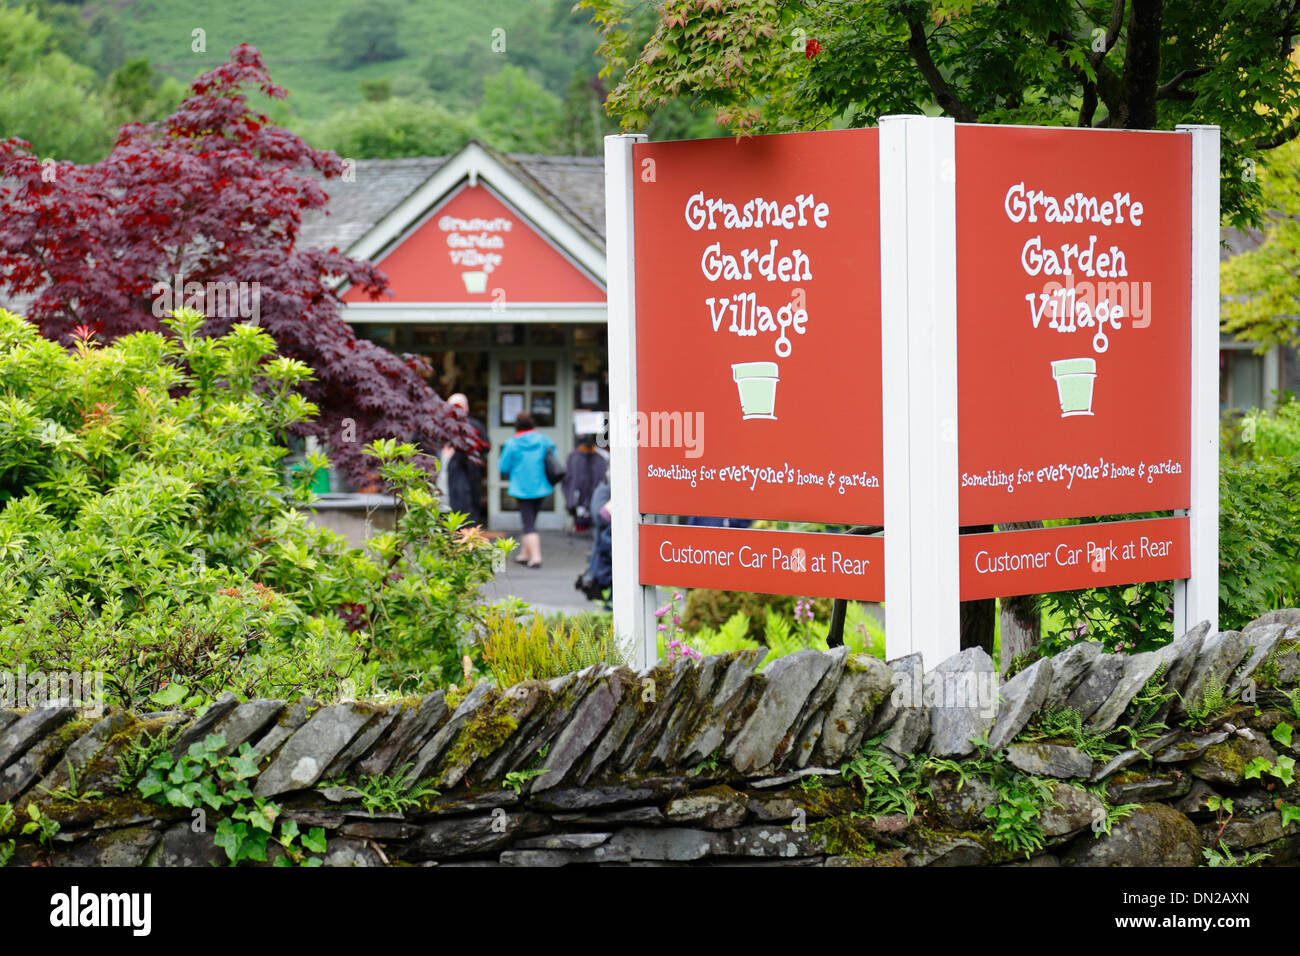 Grasmere Garden Village garden centre, Grasmere, Lake District, Cumbria, England, UK - Stock Image